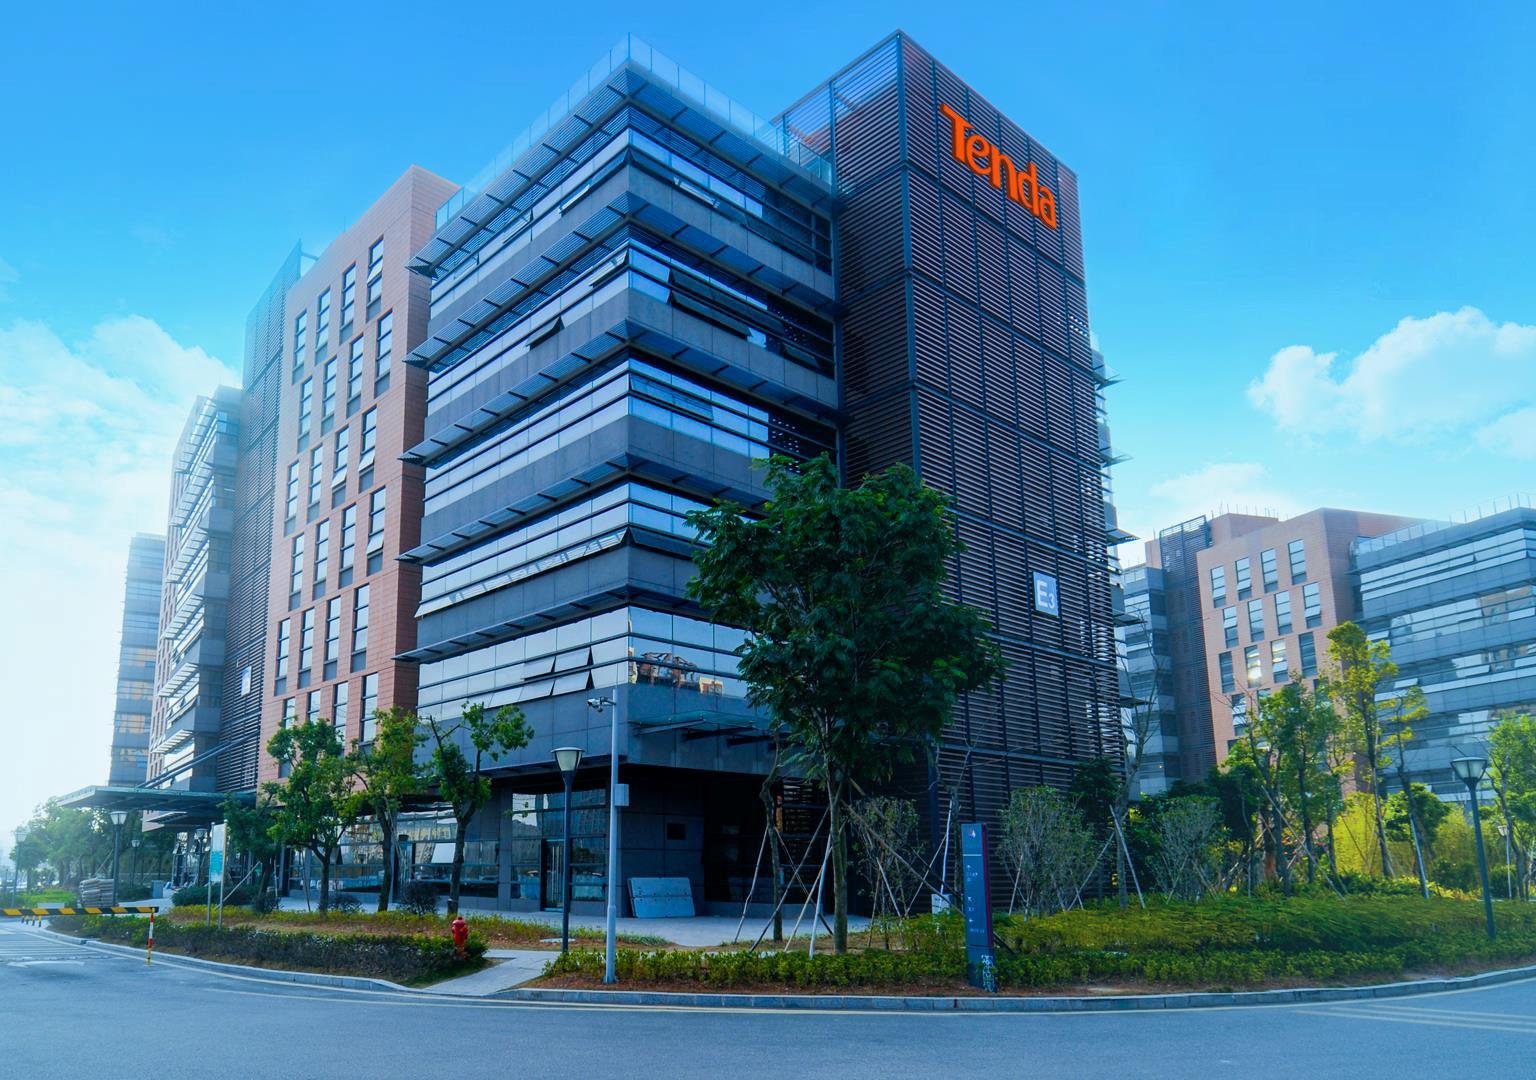 ALEF Distribution RO devine distribuitor oficial al produselor Tenda